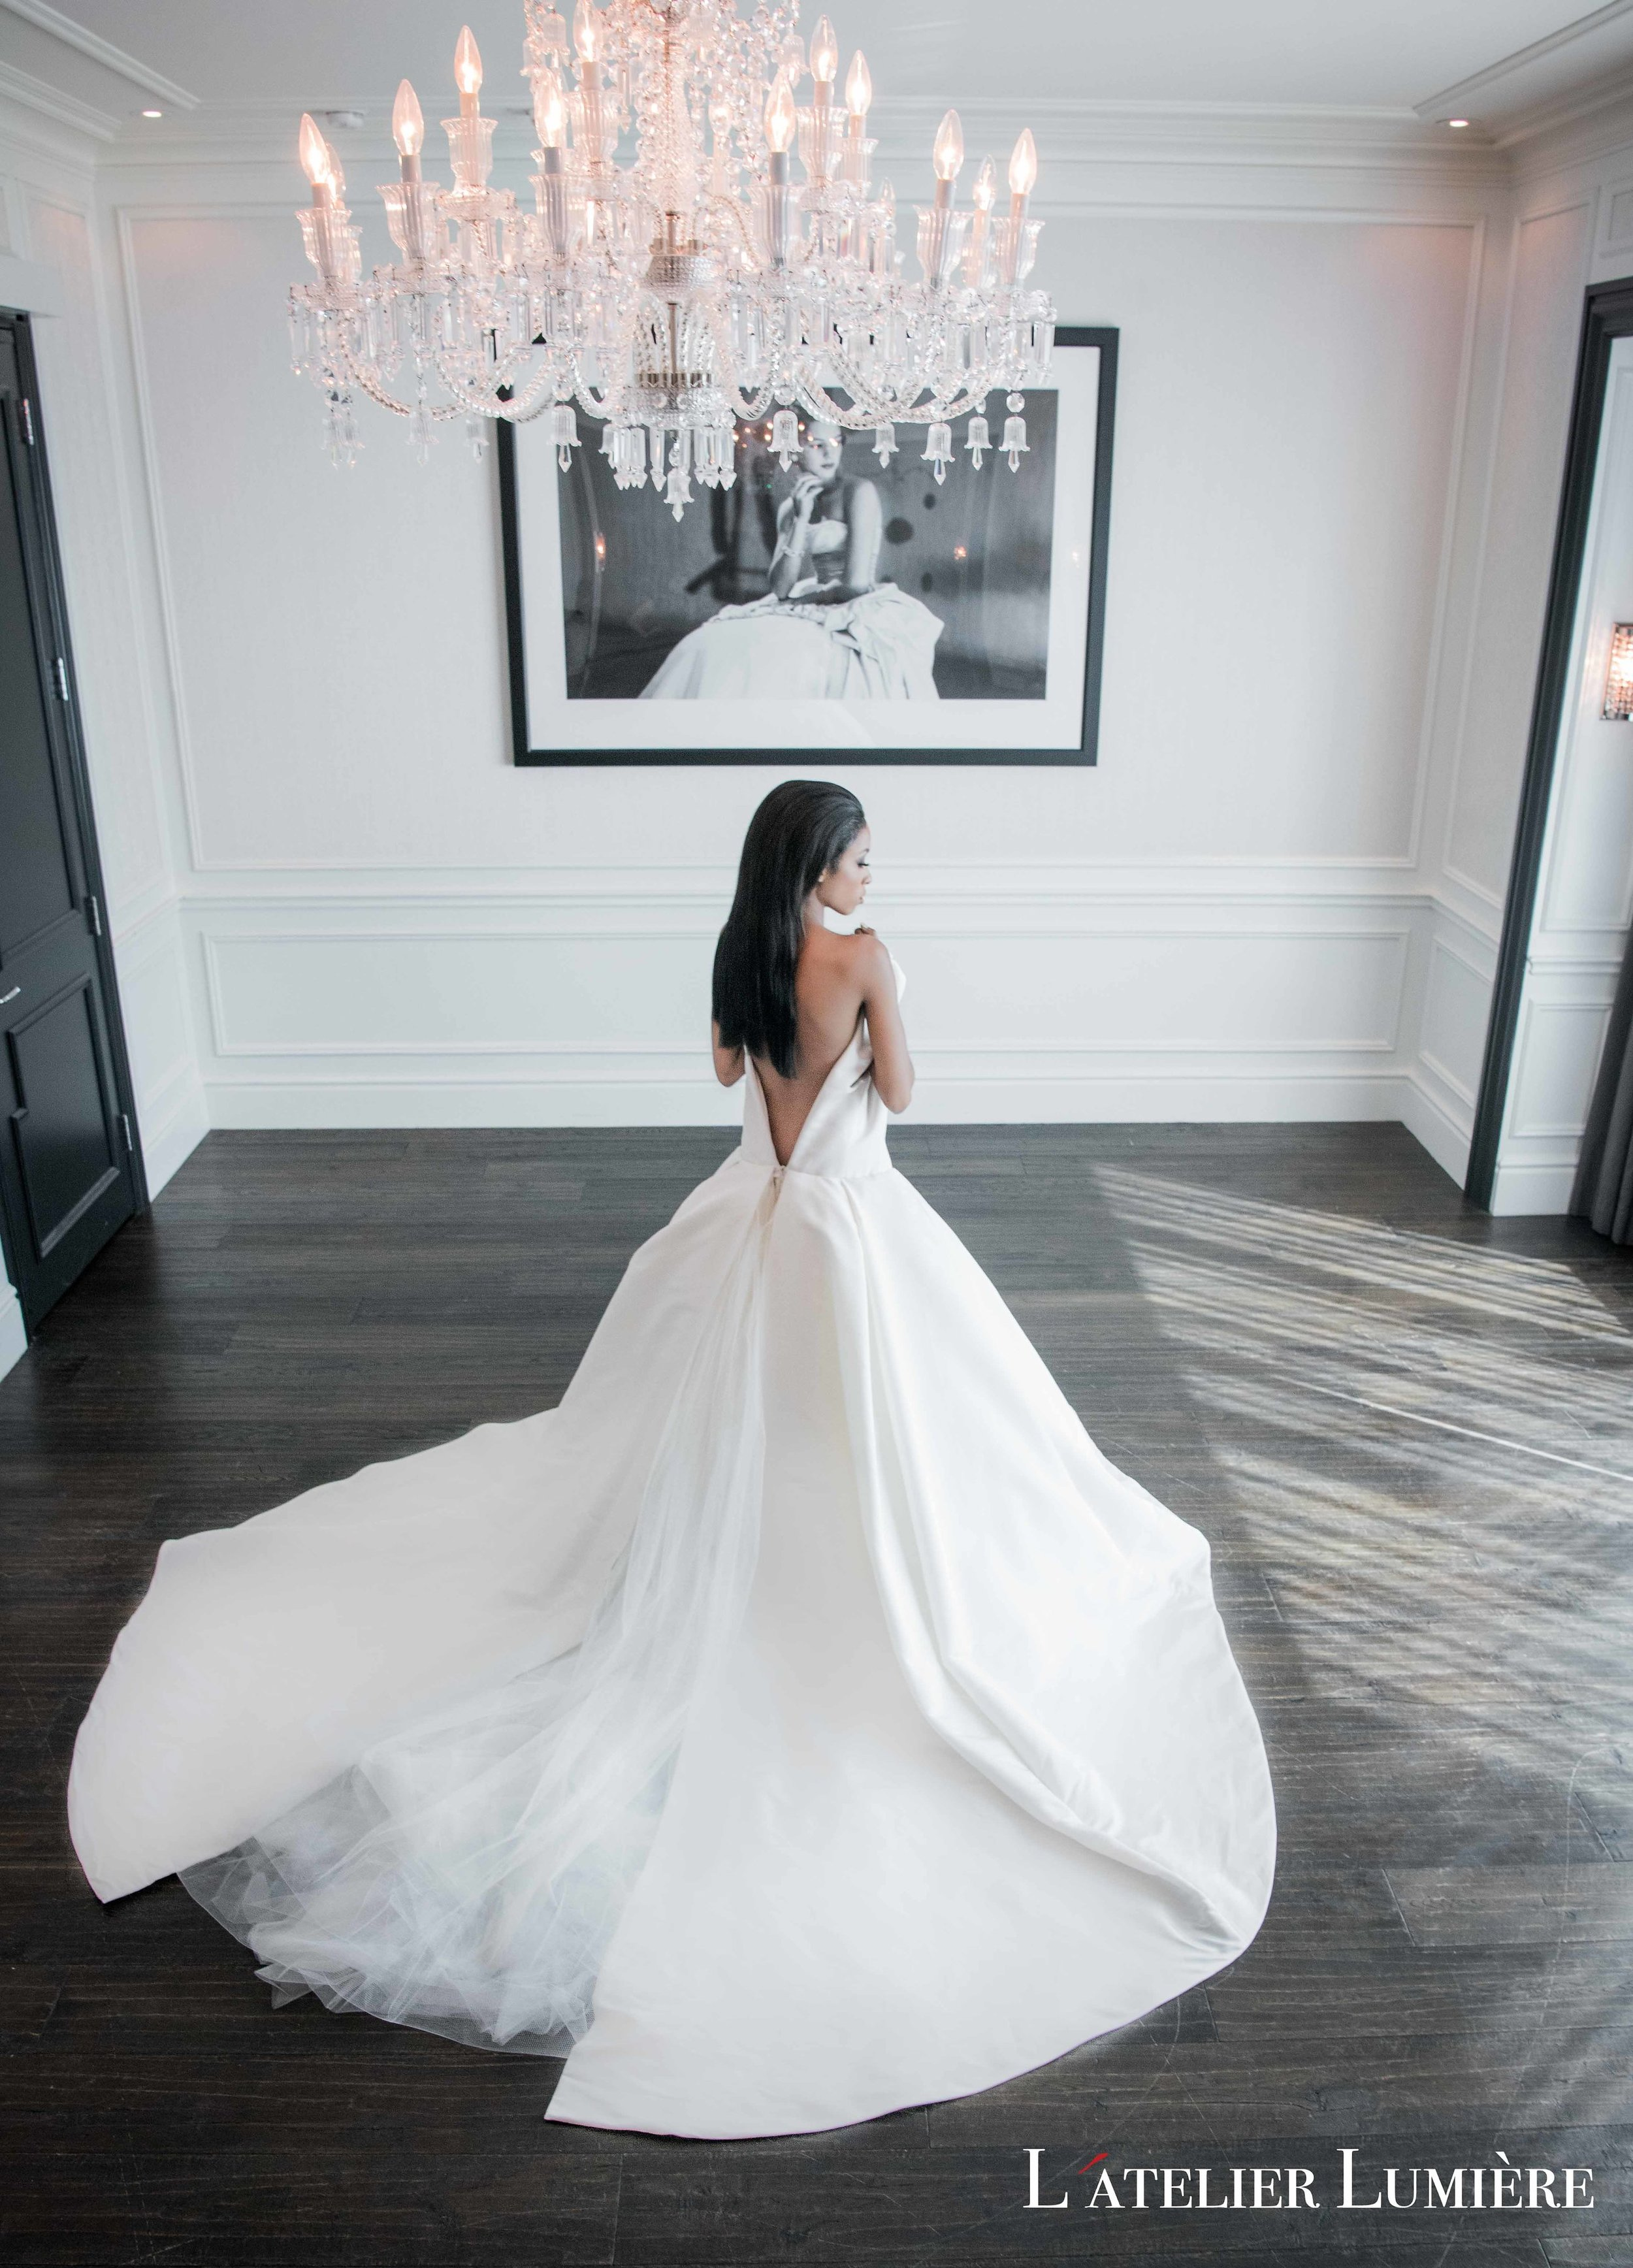 August In Bloom - Bride at reception - Riri (Grace Ormond Wedding)